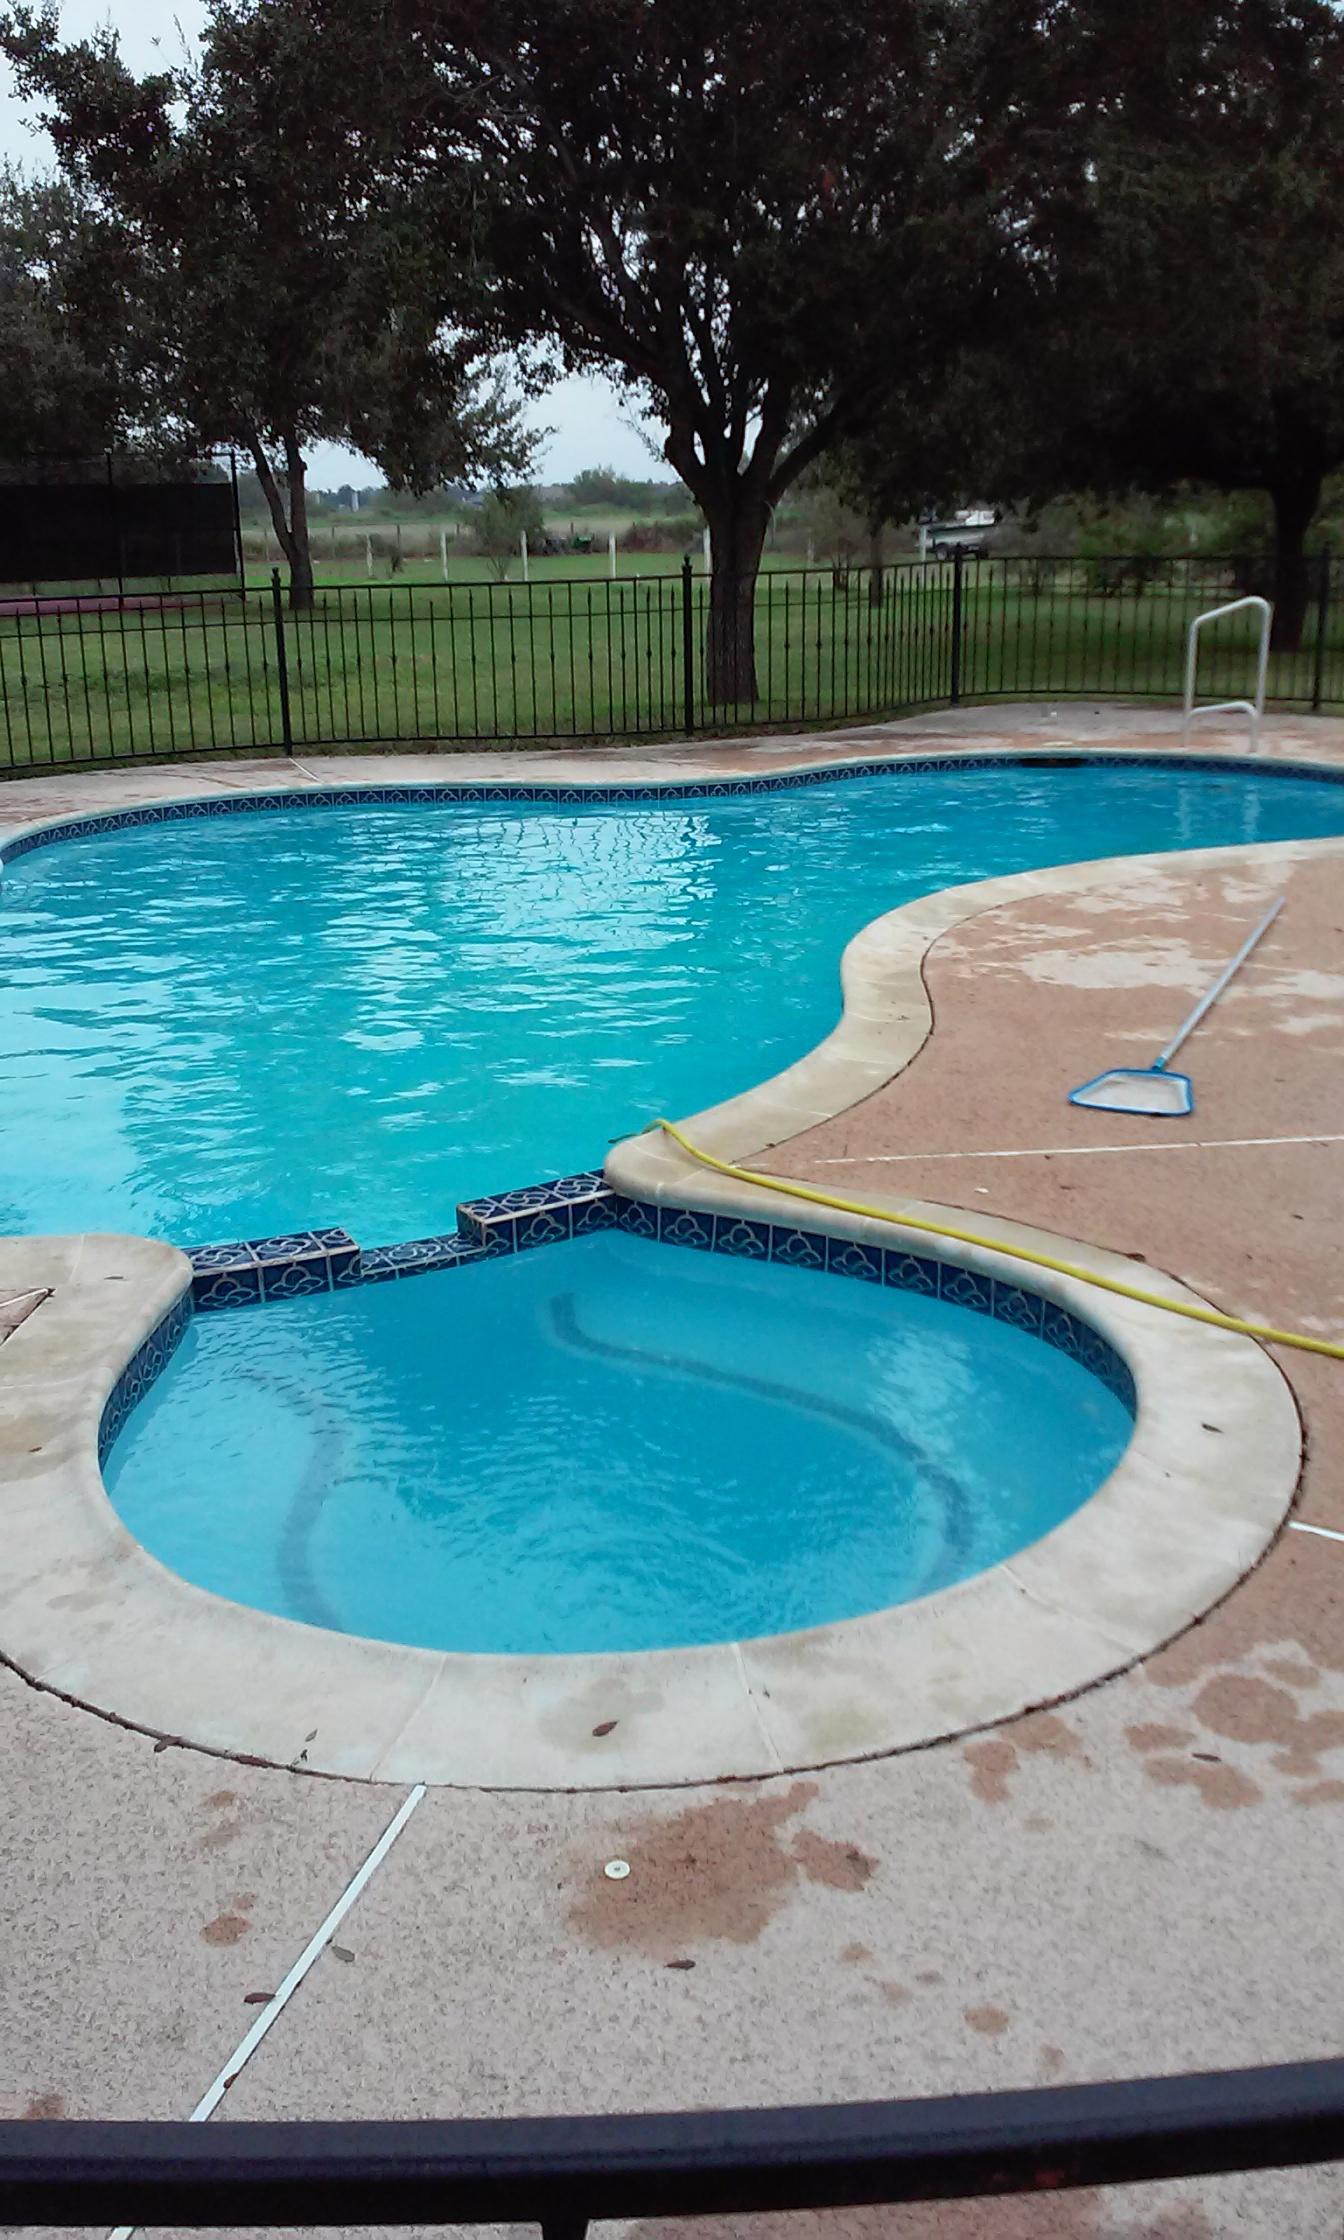 Paradise Pool Service in McAllen TX